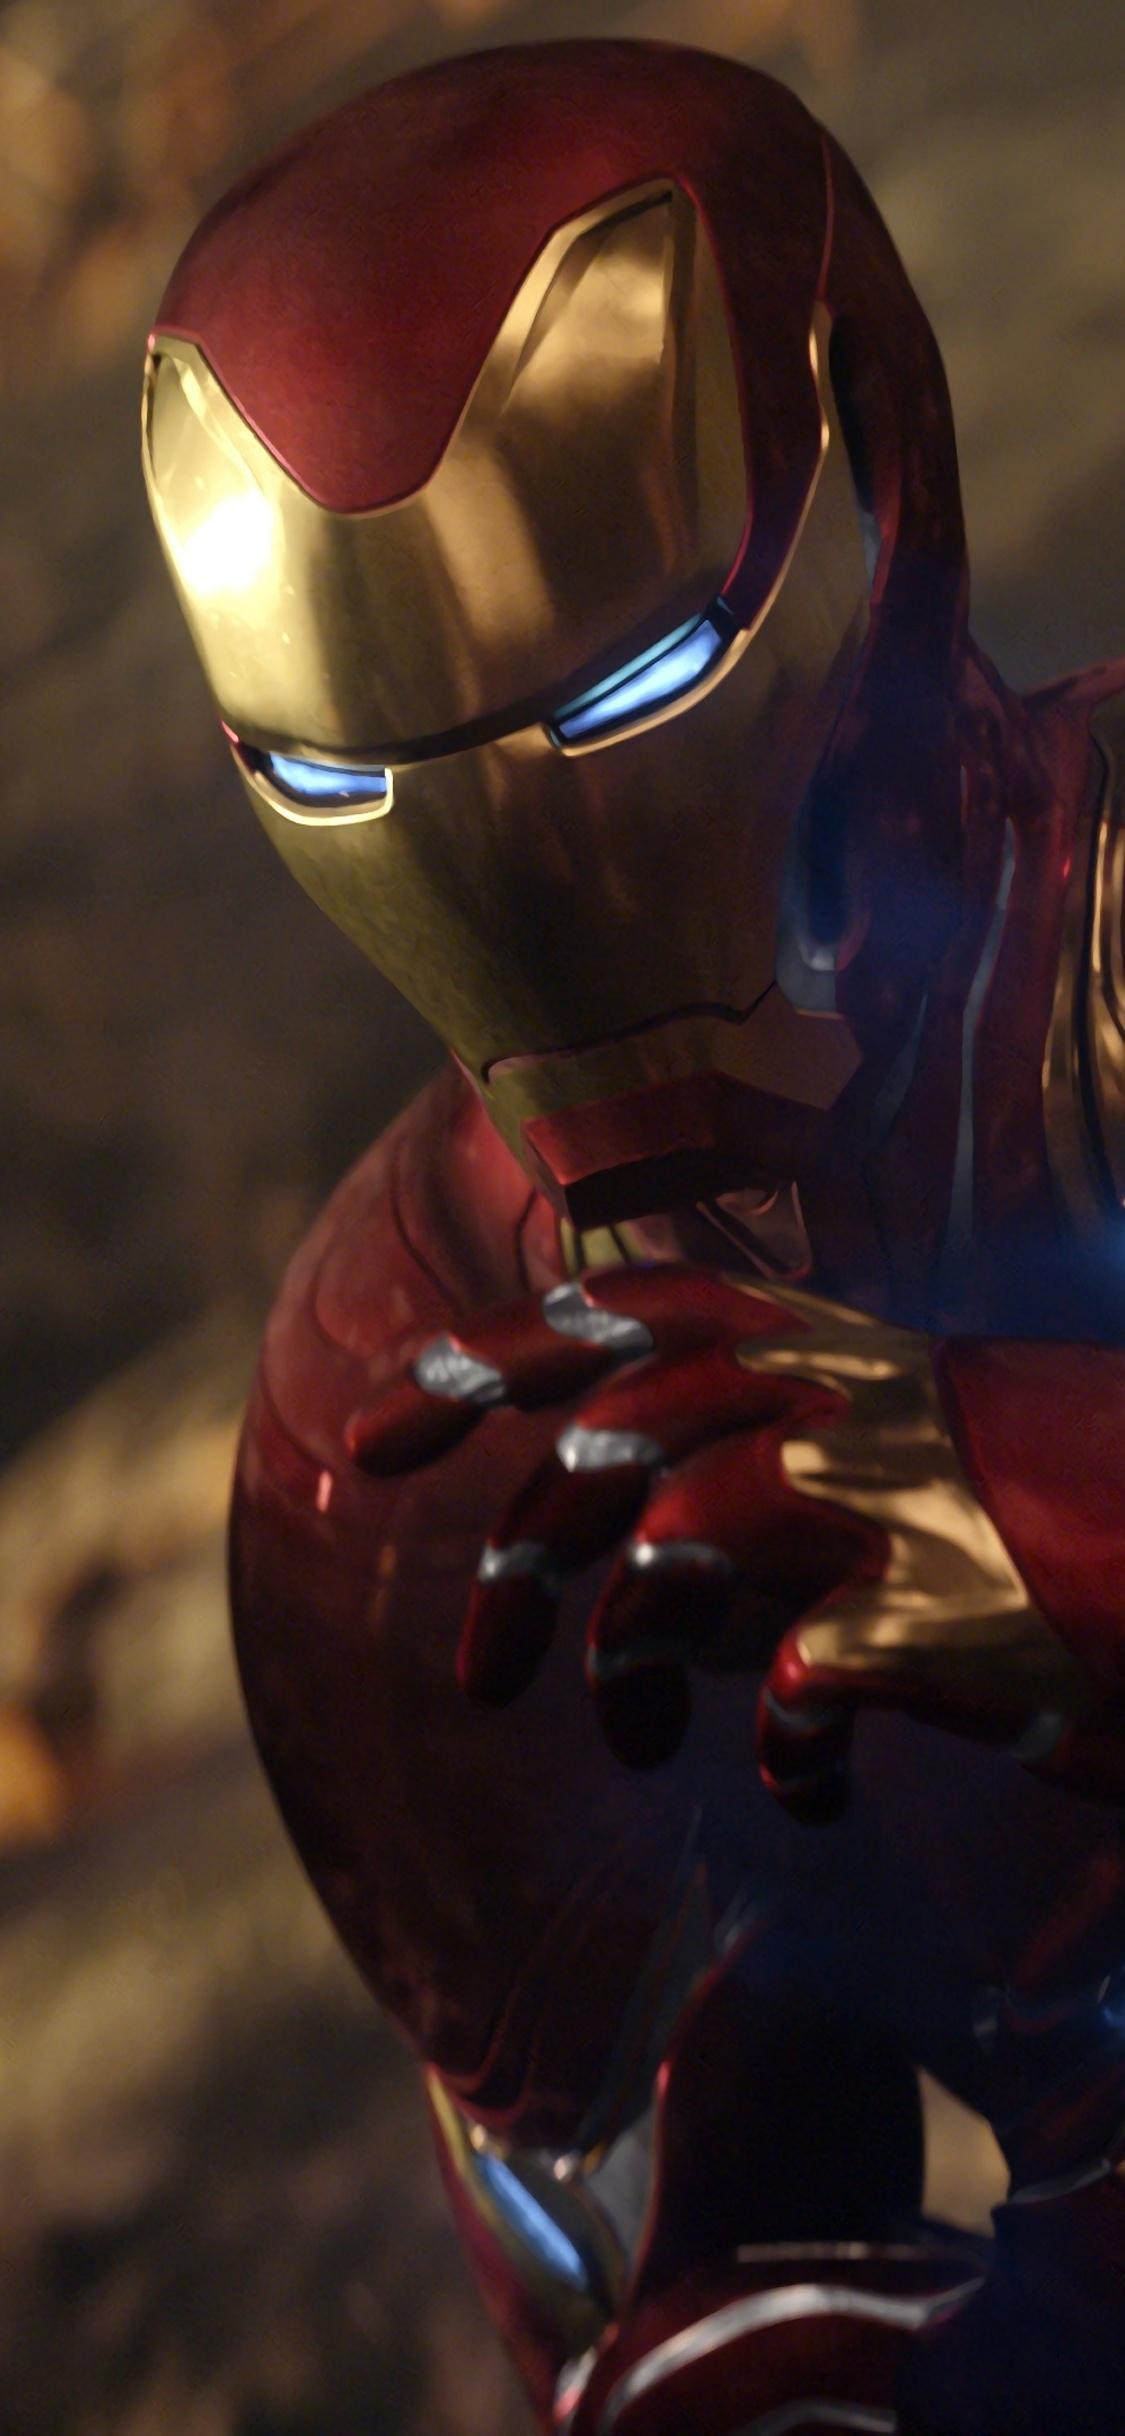 1125x2436 Avengers Infinity War Iron Man Marvel 4k Iphone ...